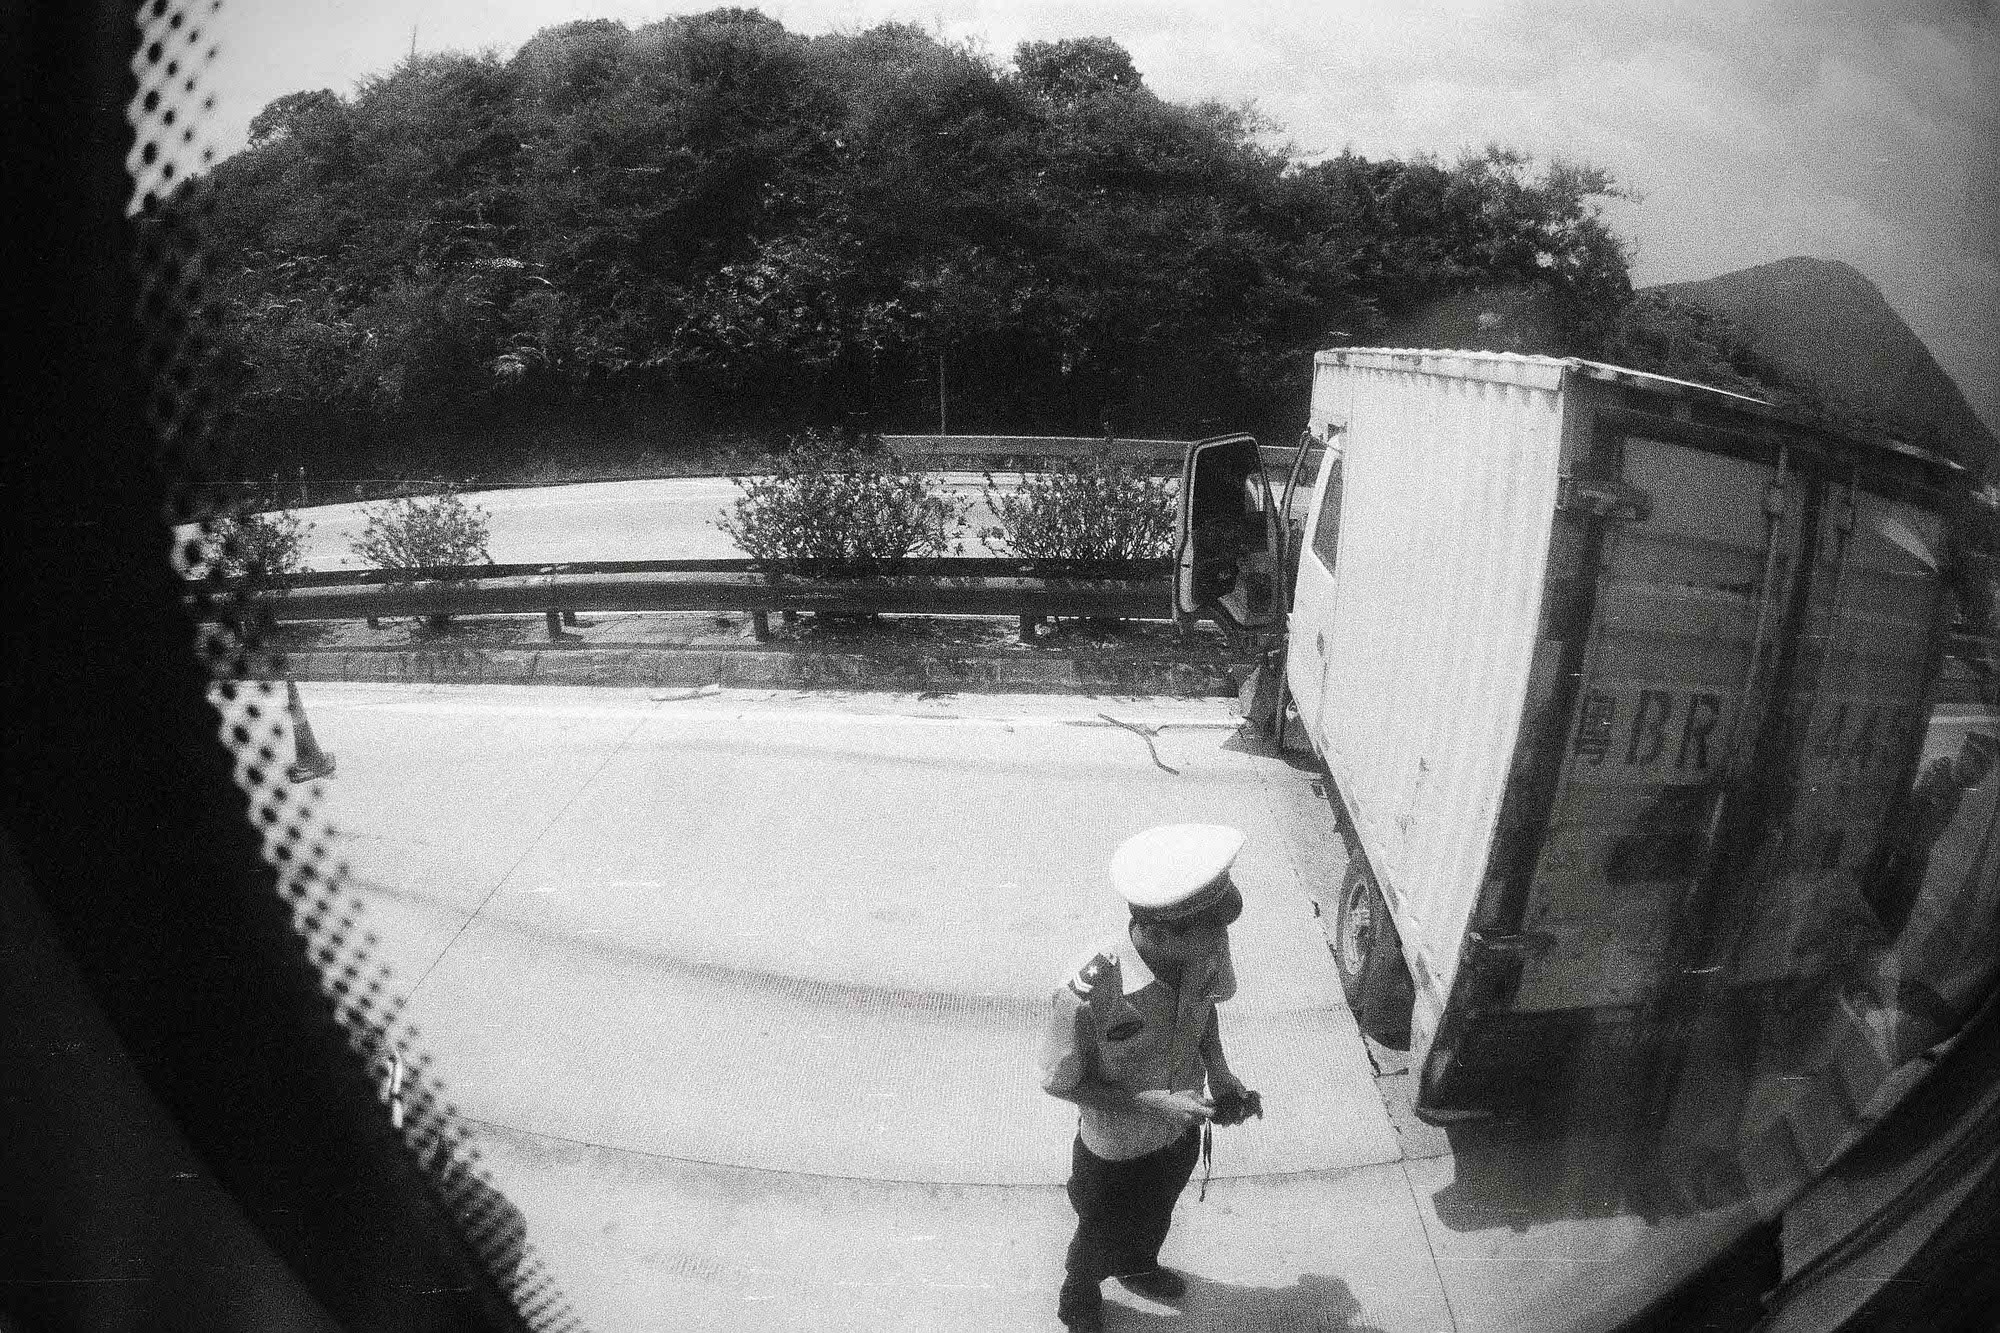 35mmPatrikWallner_Huizhou_CarAccidentCloserLOWQ